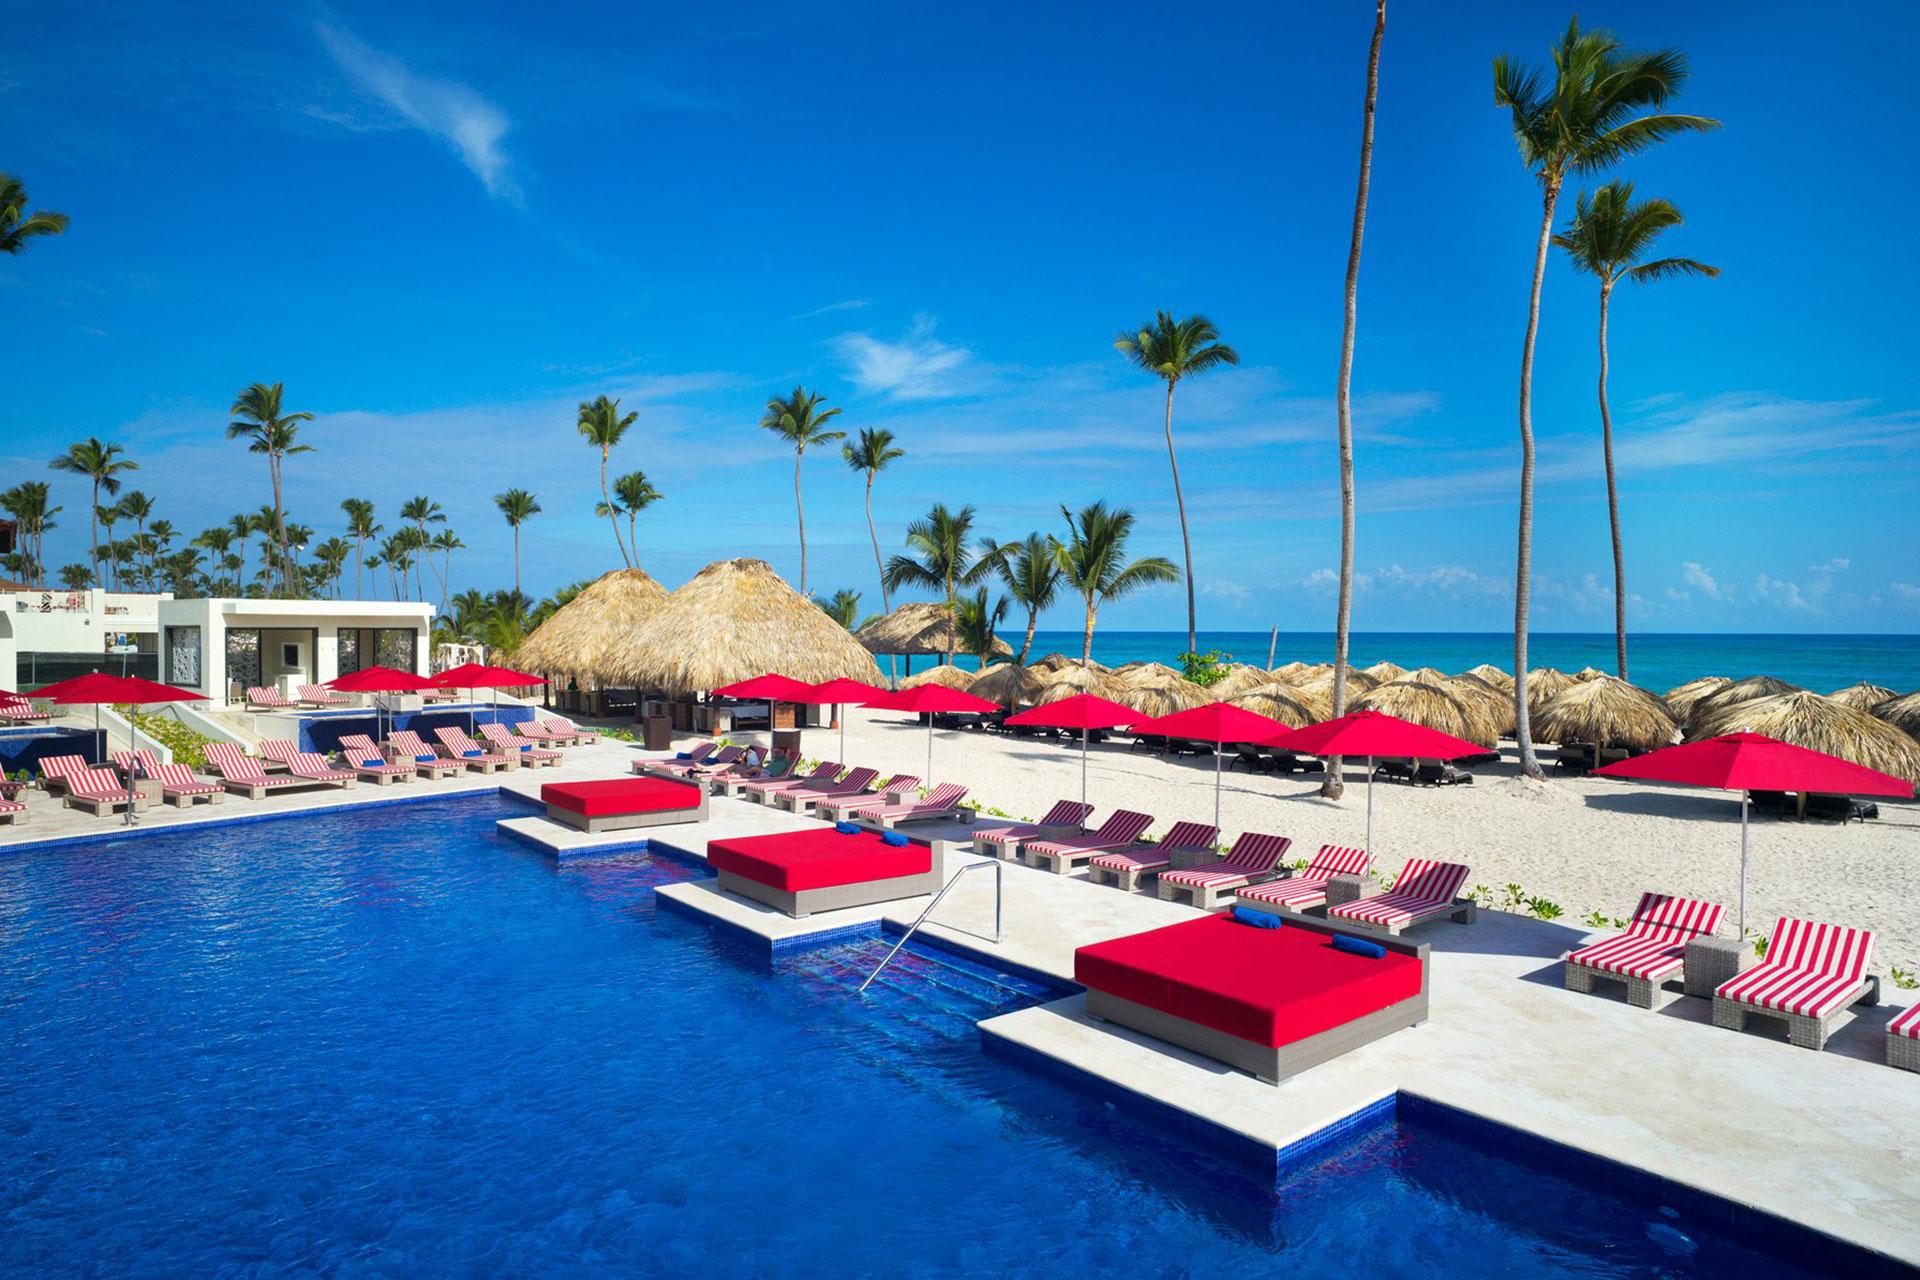 Royalton Bavaro Resort and Spa in the Dominican Republic